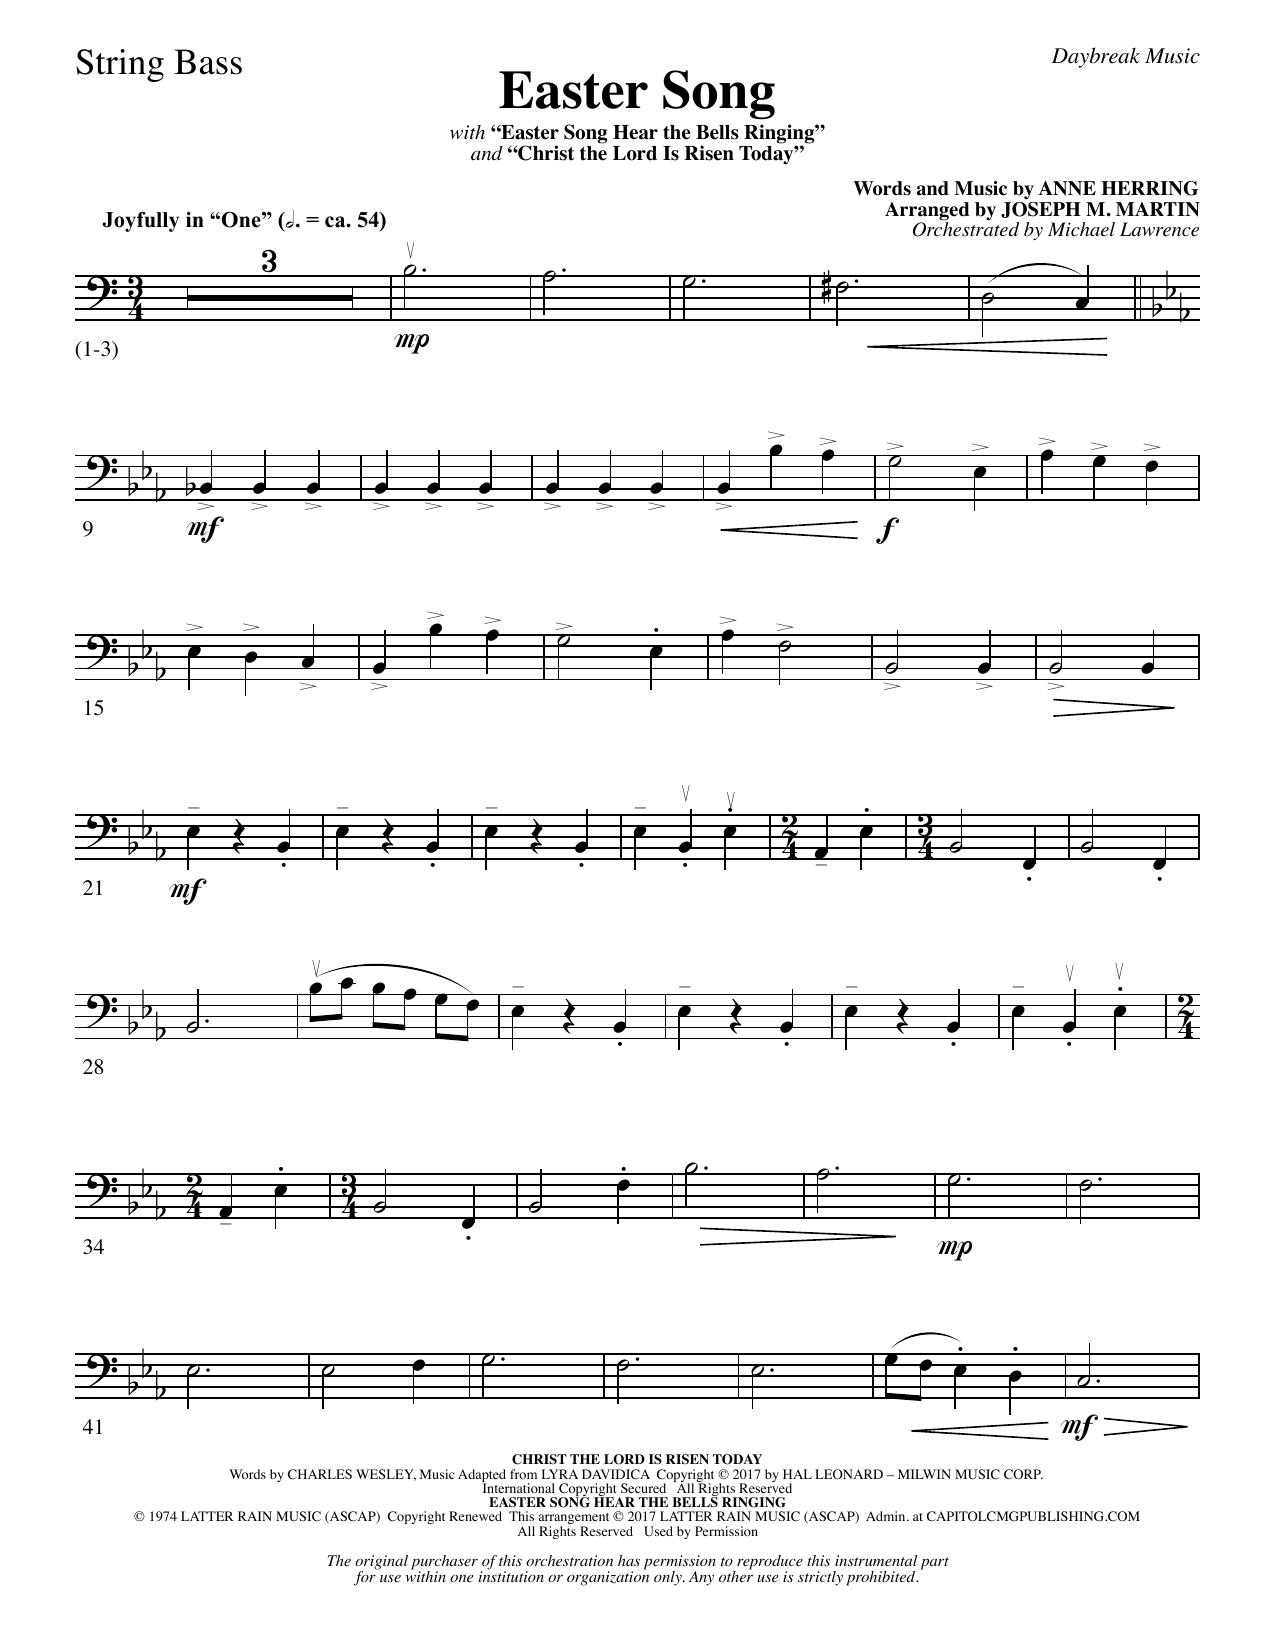 Easter Song - String Bass Sheet Music